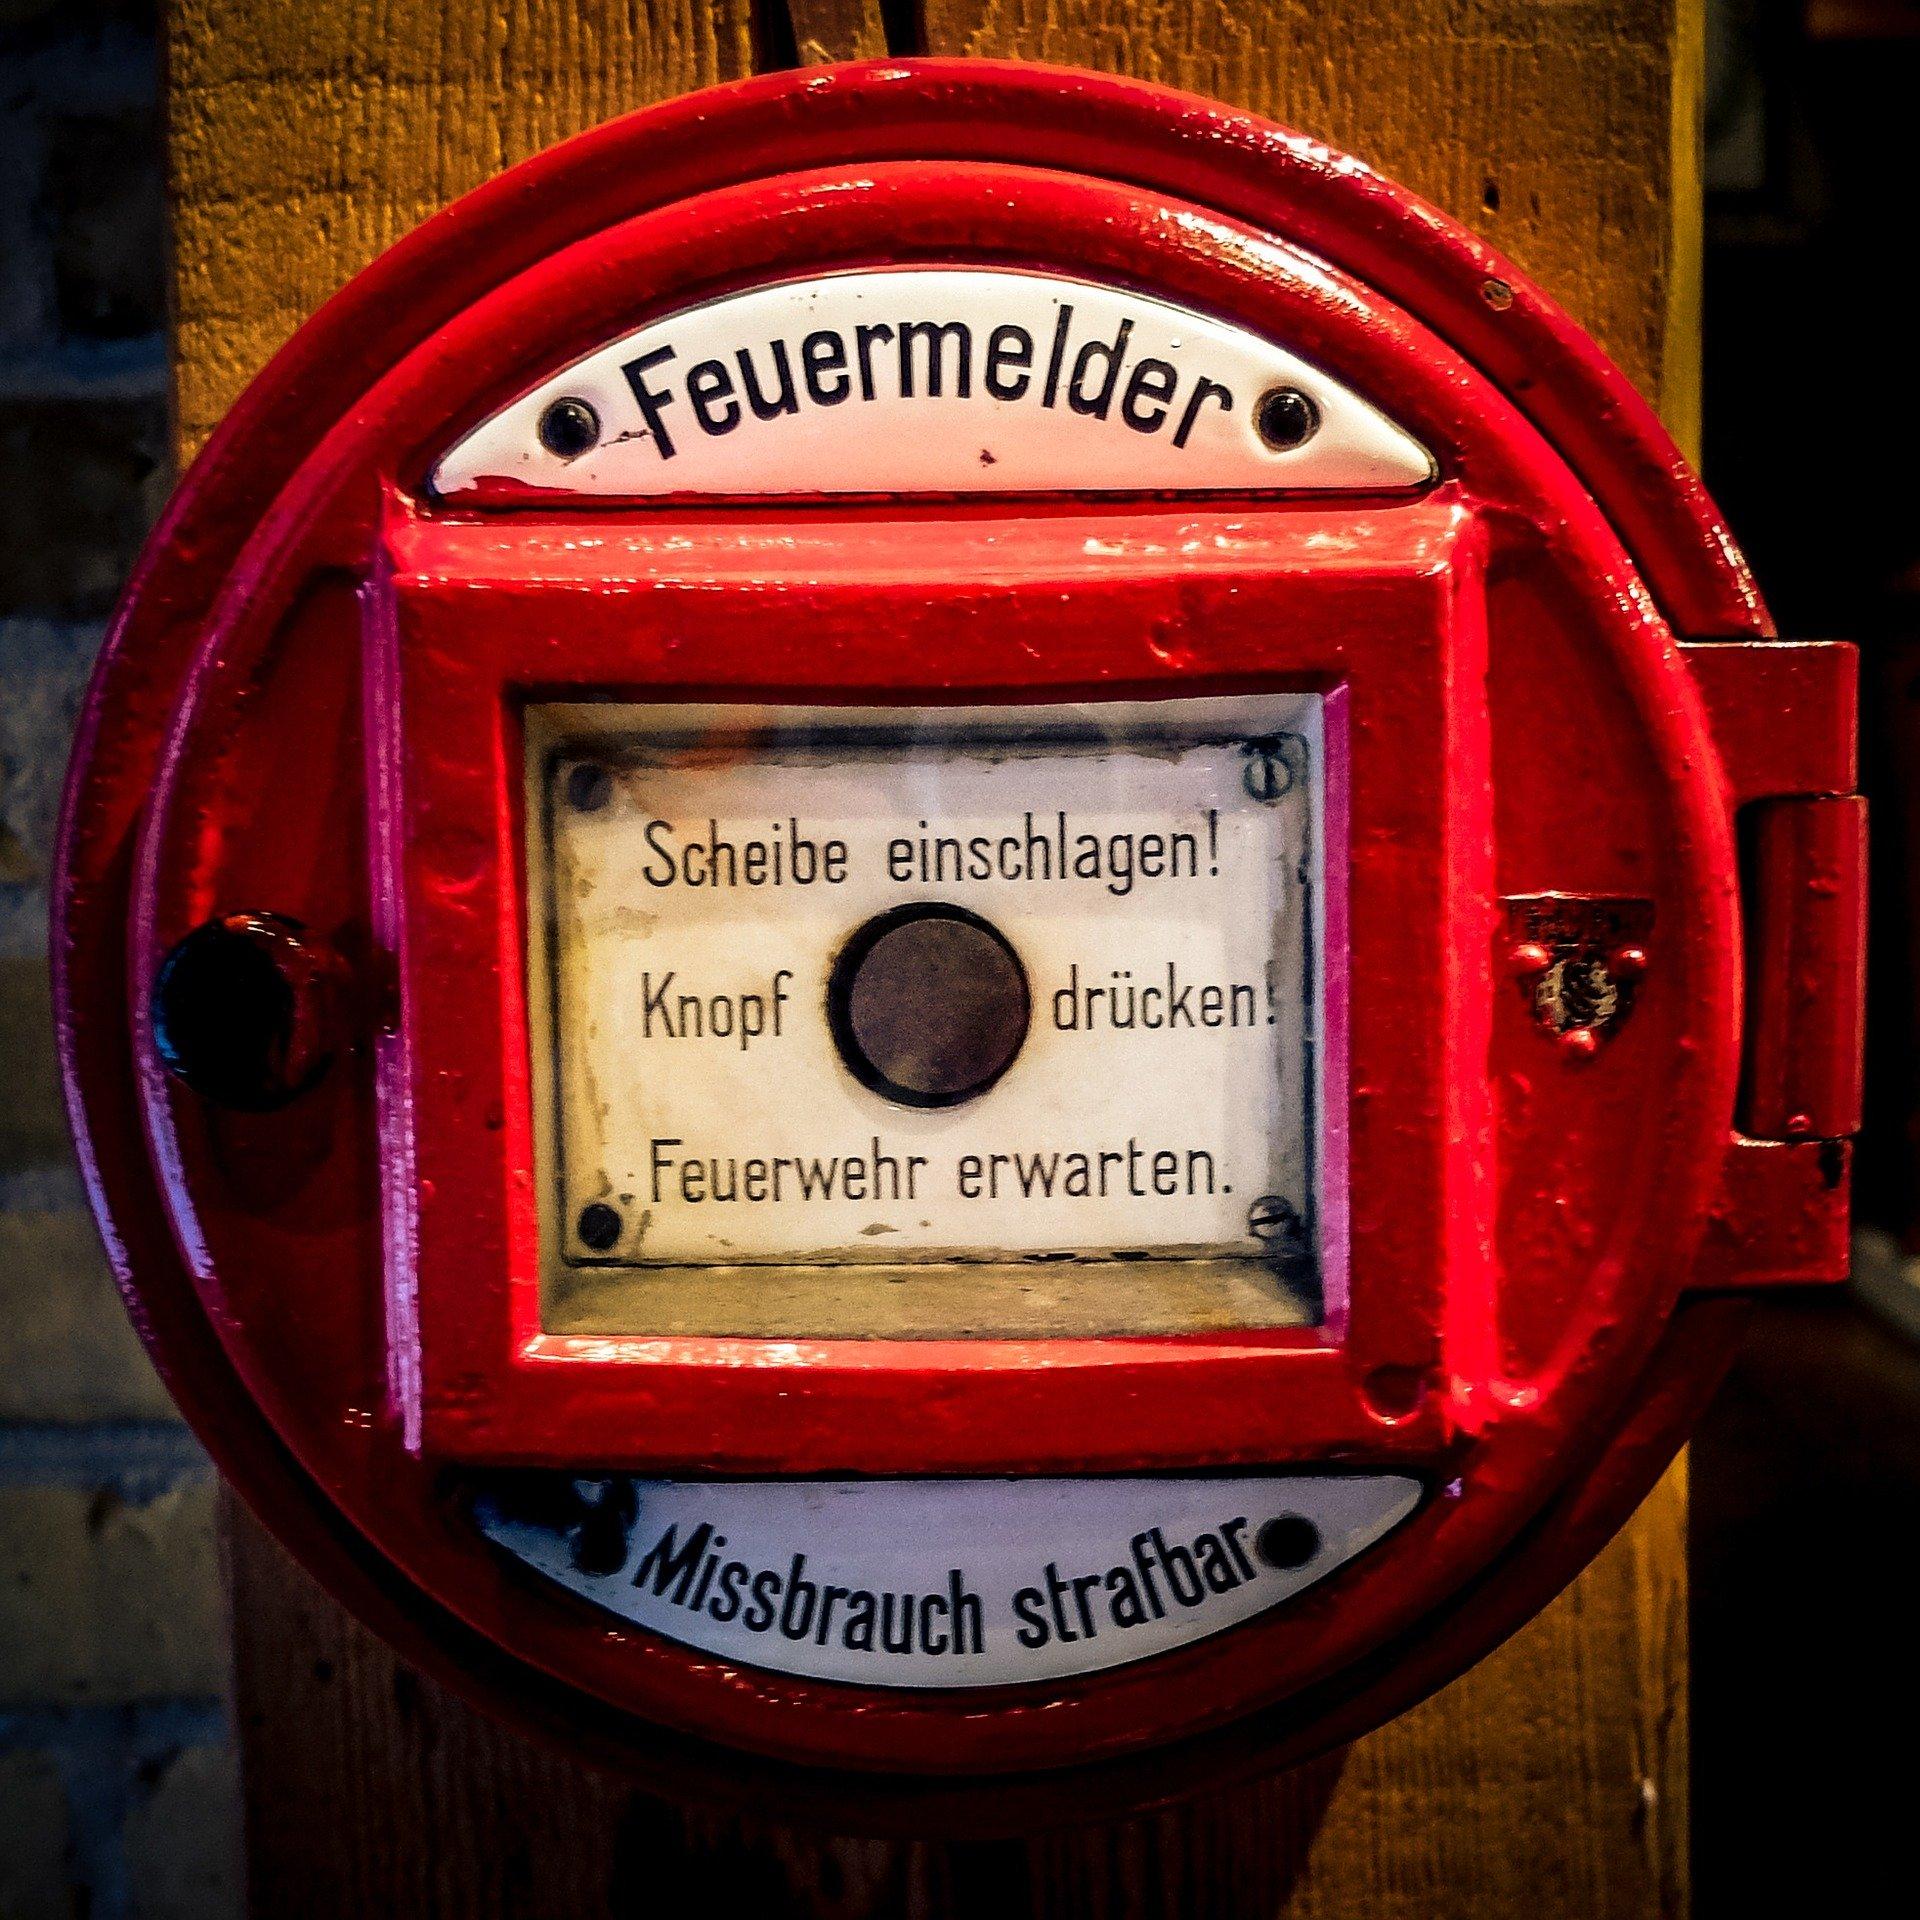 IT-Notfall - es brennt ... Foto: Thomas Wolter via Pixabay